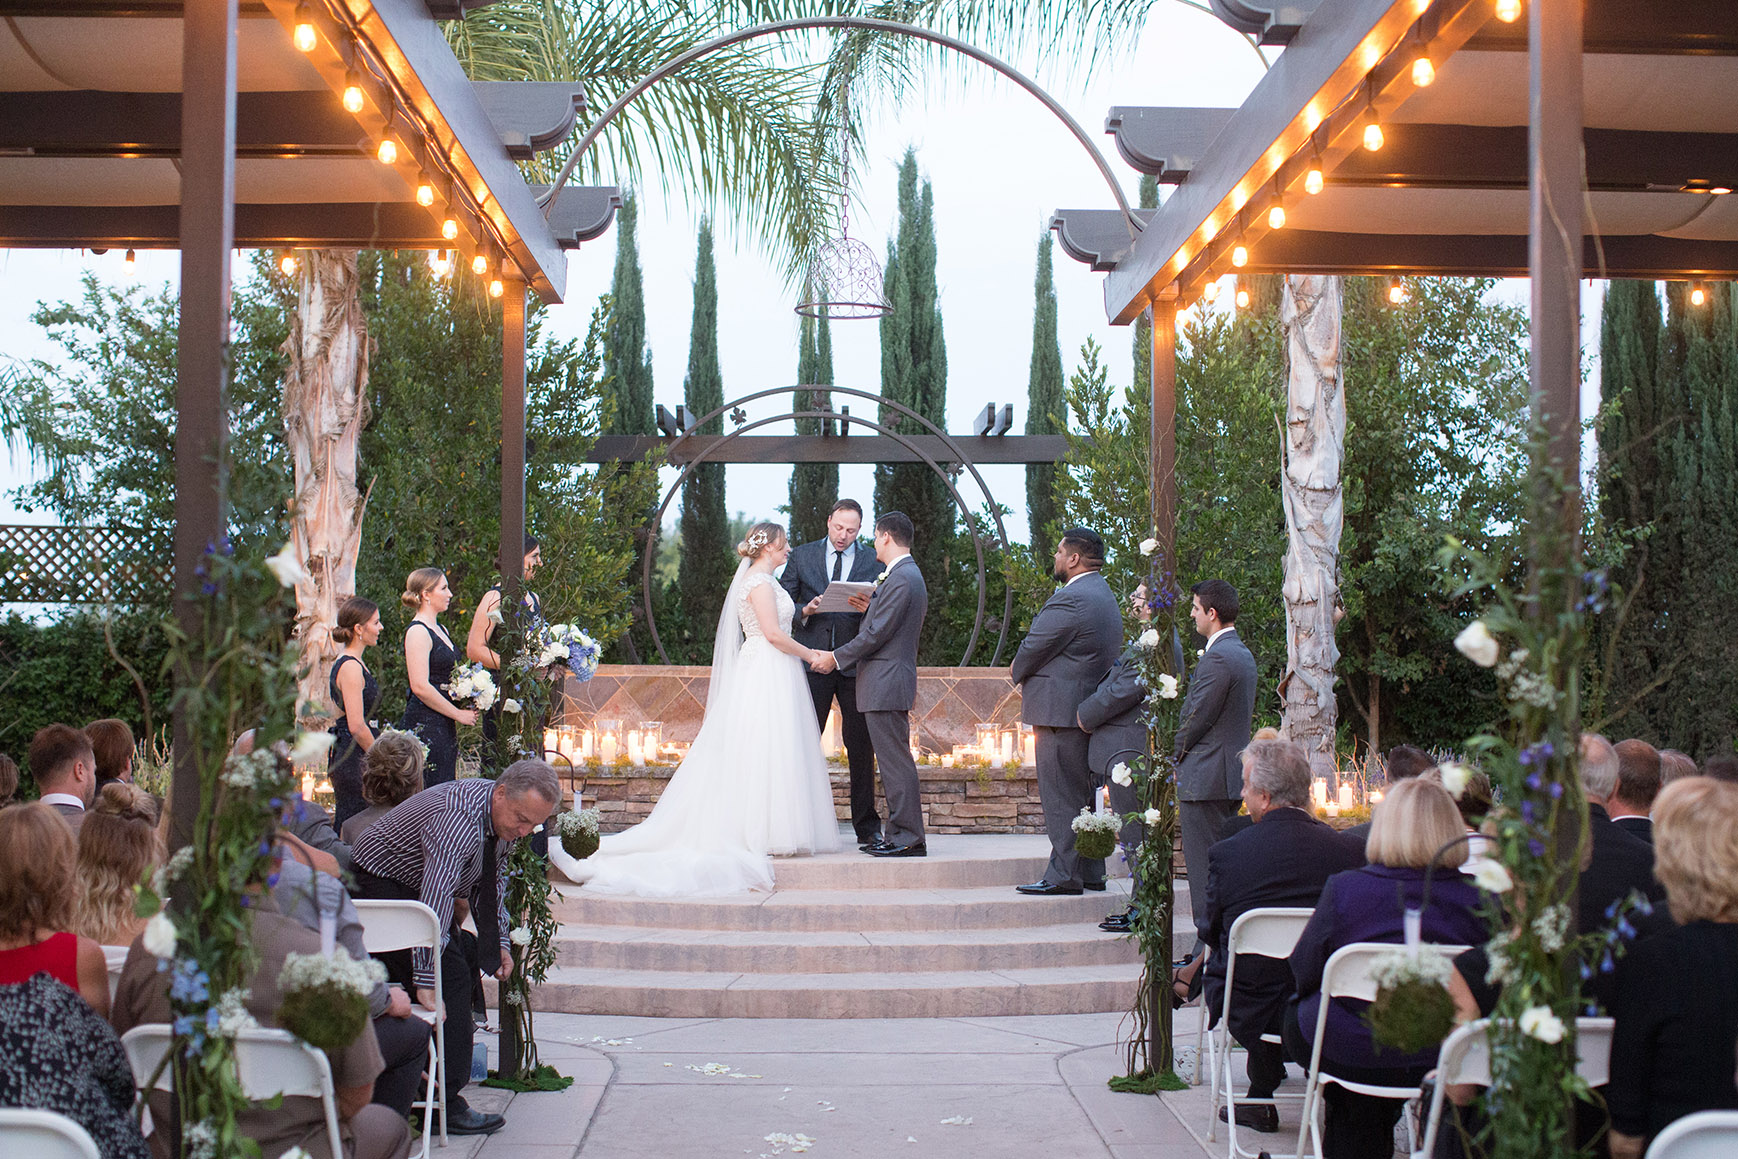 Candlelit ceremony - Fresno - Fresno, California - Frenso County - Wedgewood Weddngs